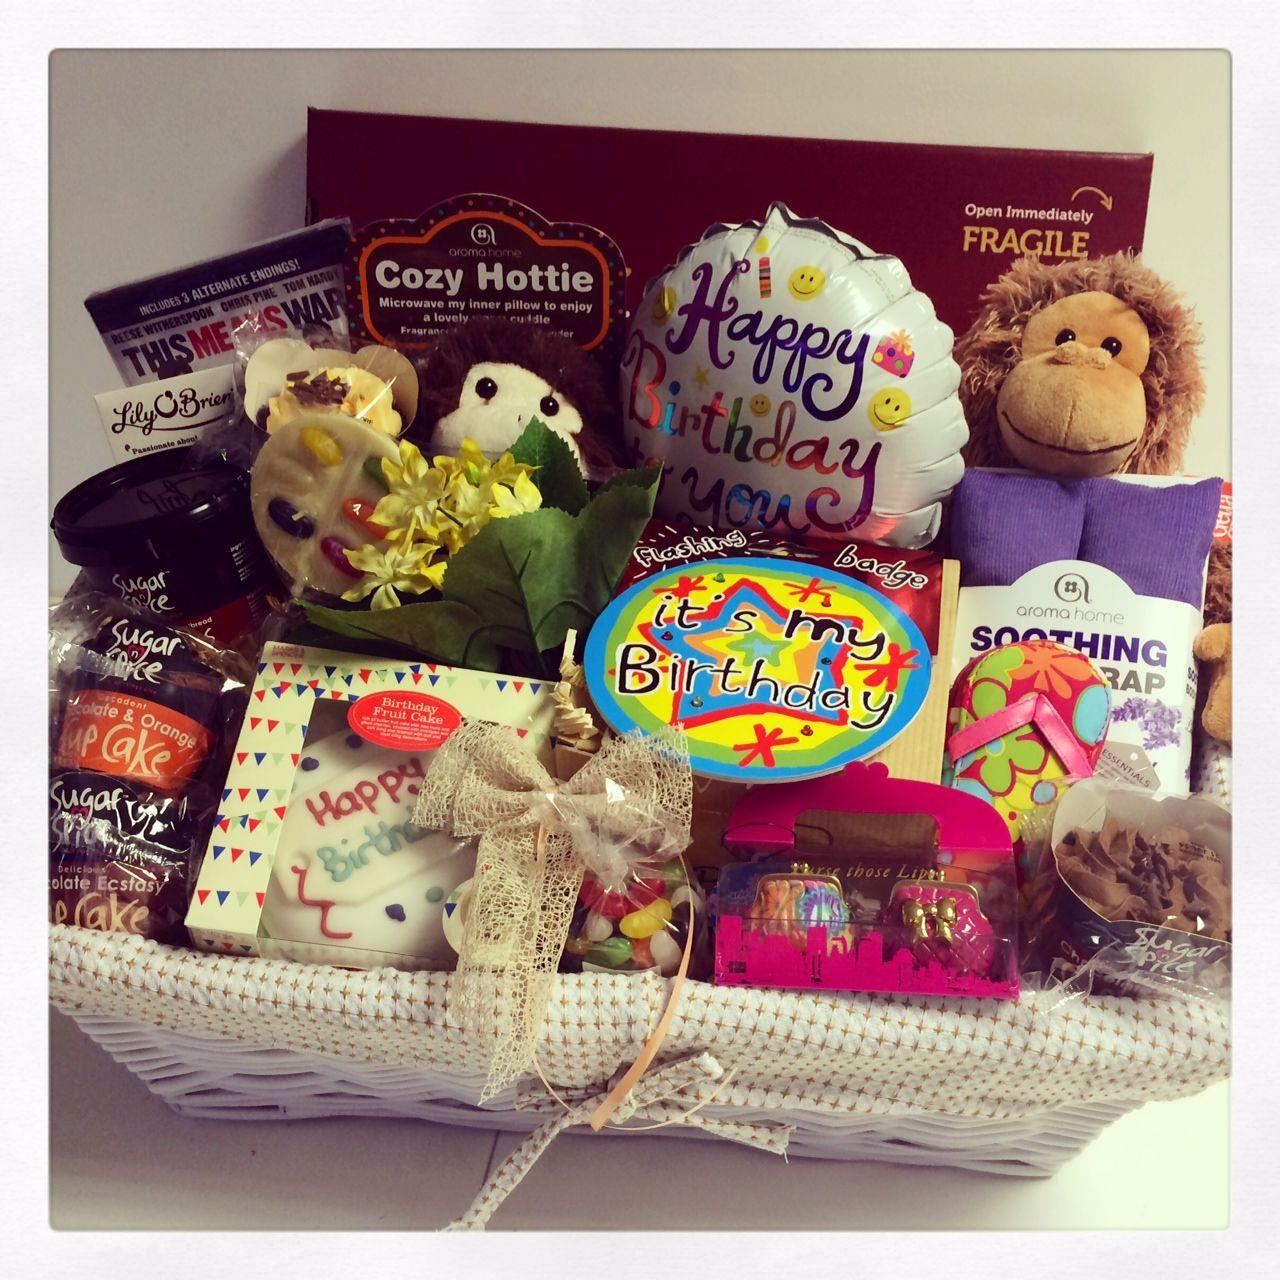 18th Birthday Gift Basket Ideas